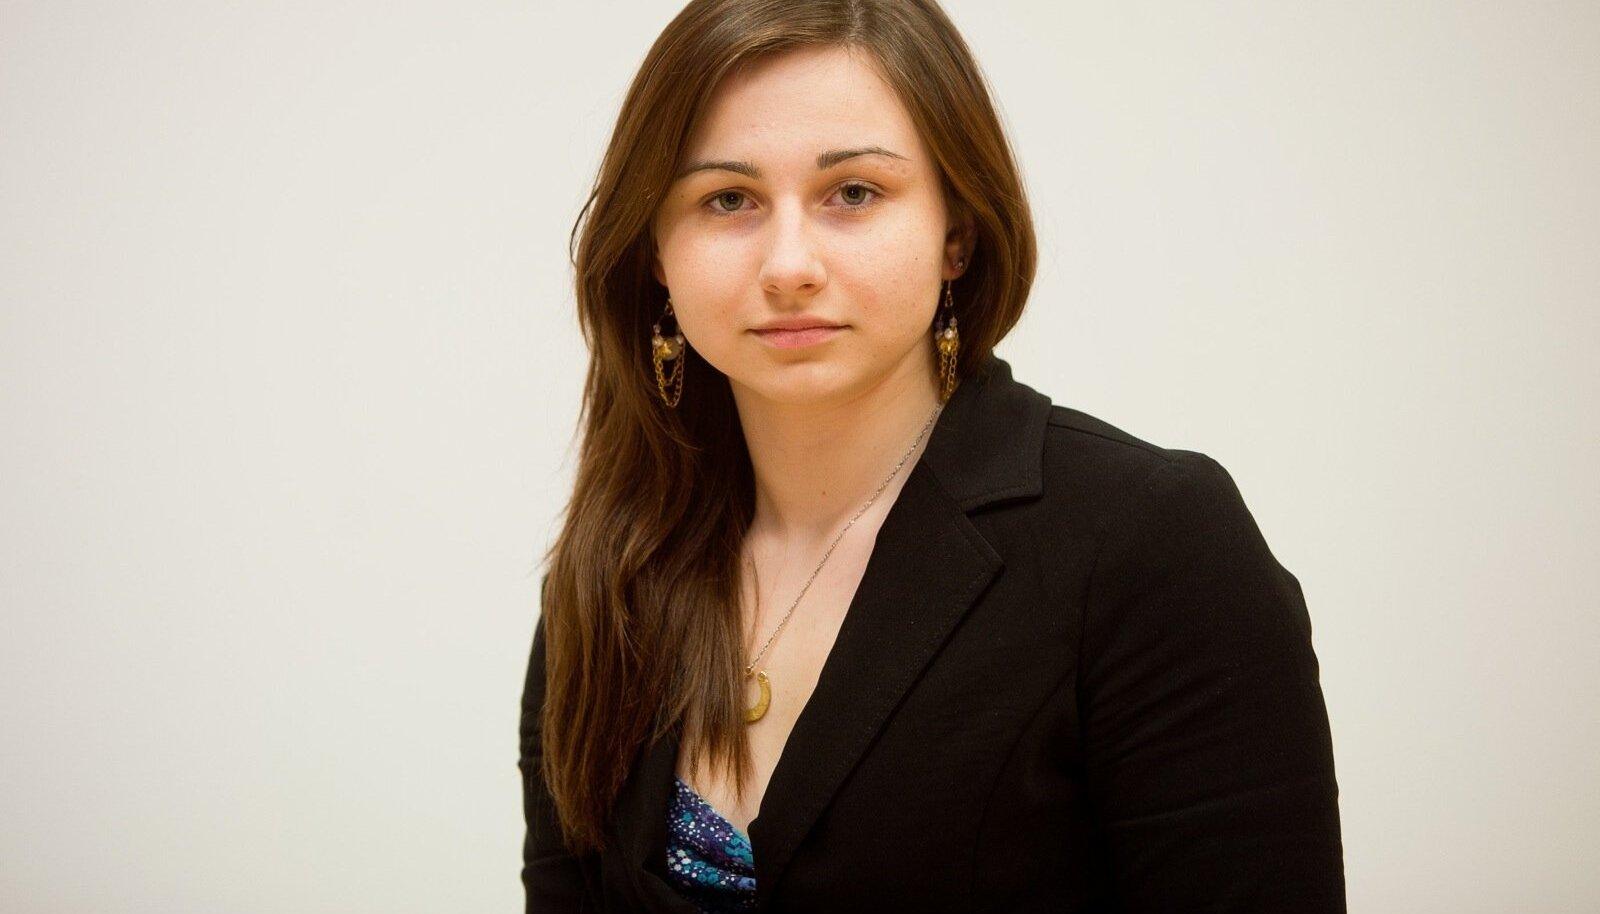 Liina Hirv